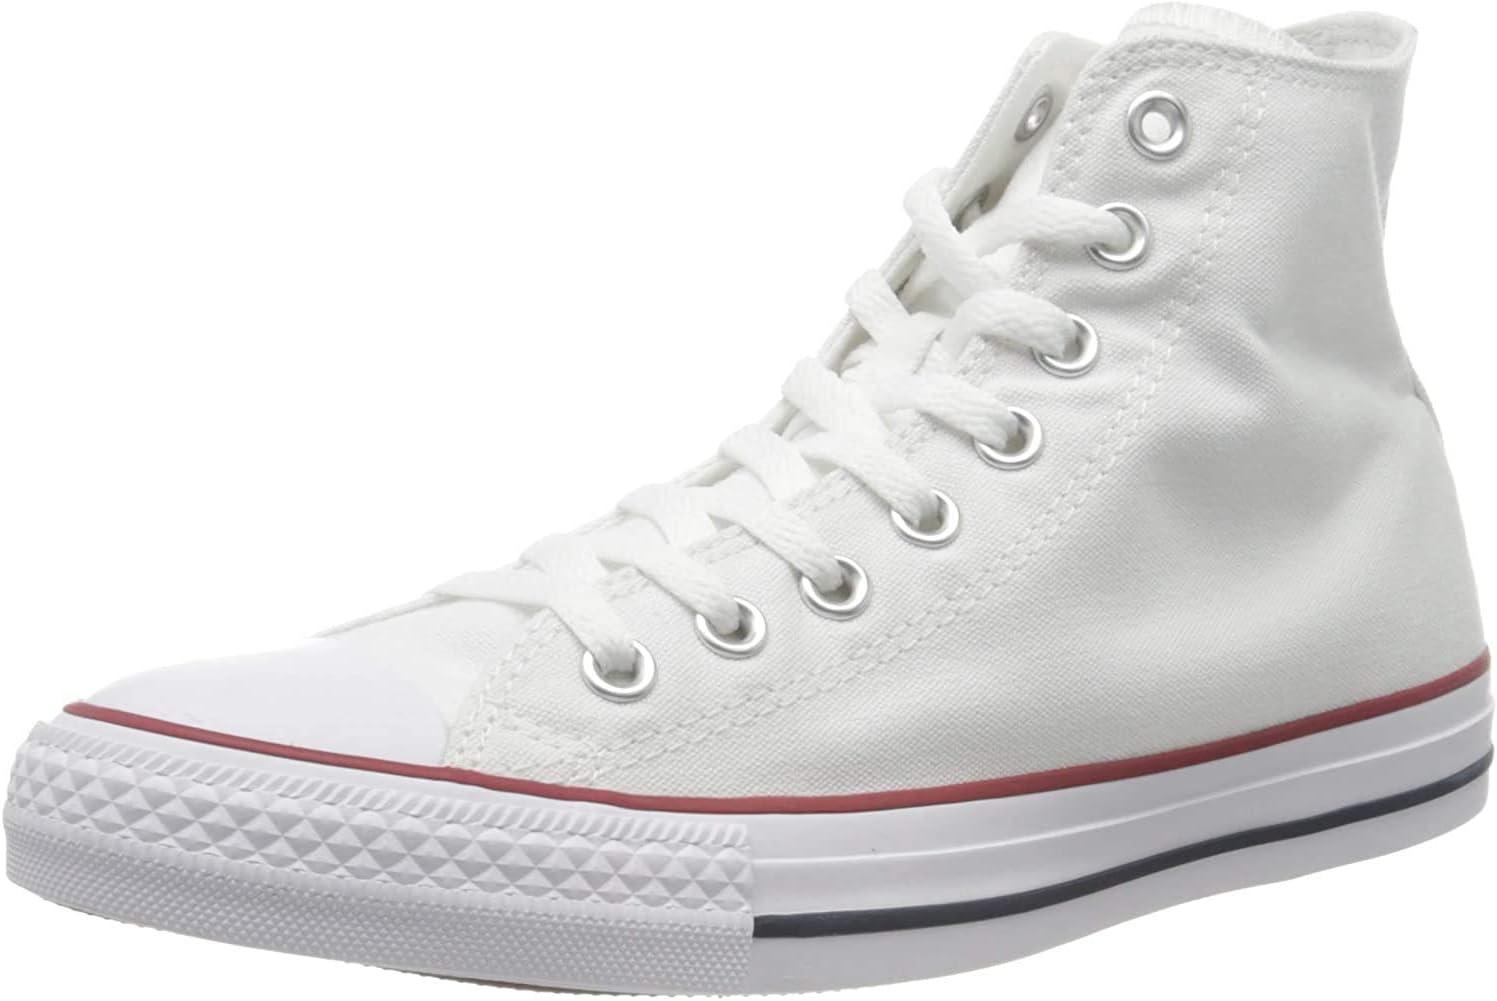 Converse Chuck Taylor All Star Season Hi Sneakers voor volwassenen, uniseks Wit. 7sNQXsRH